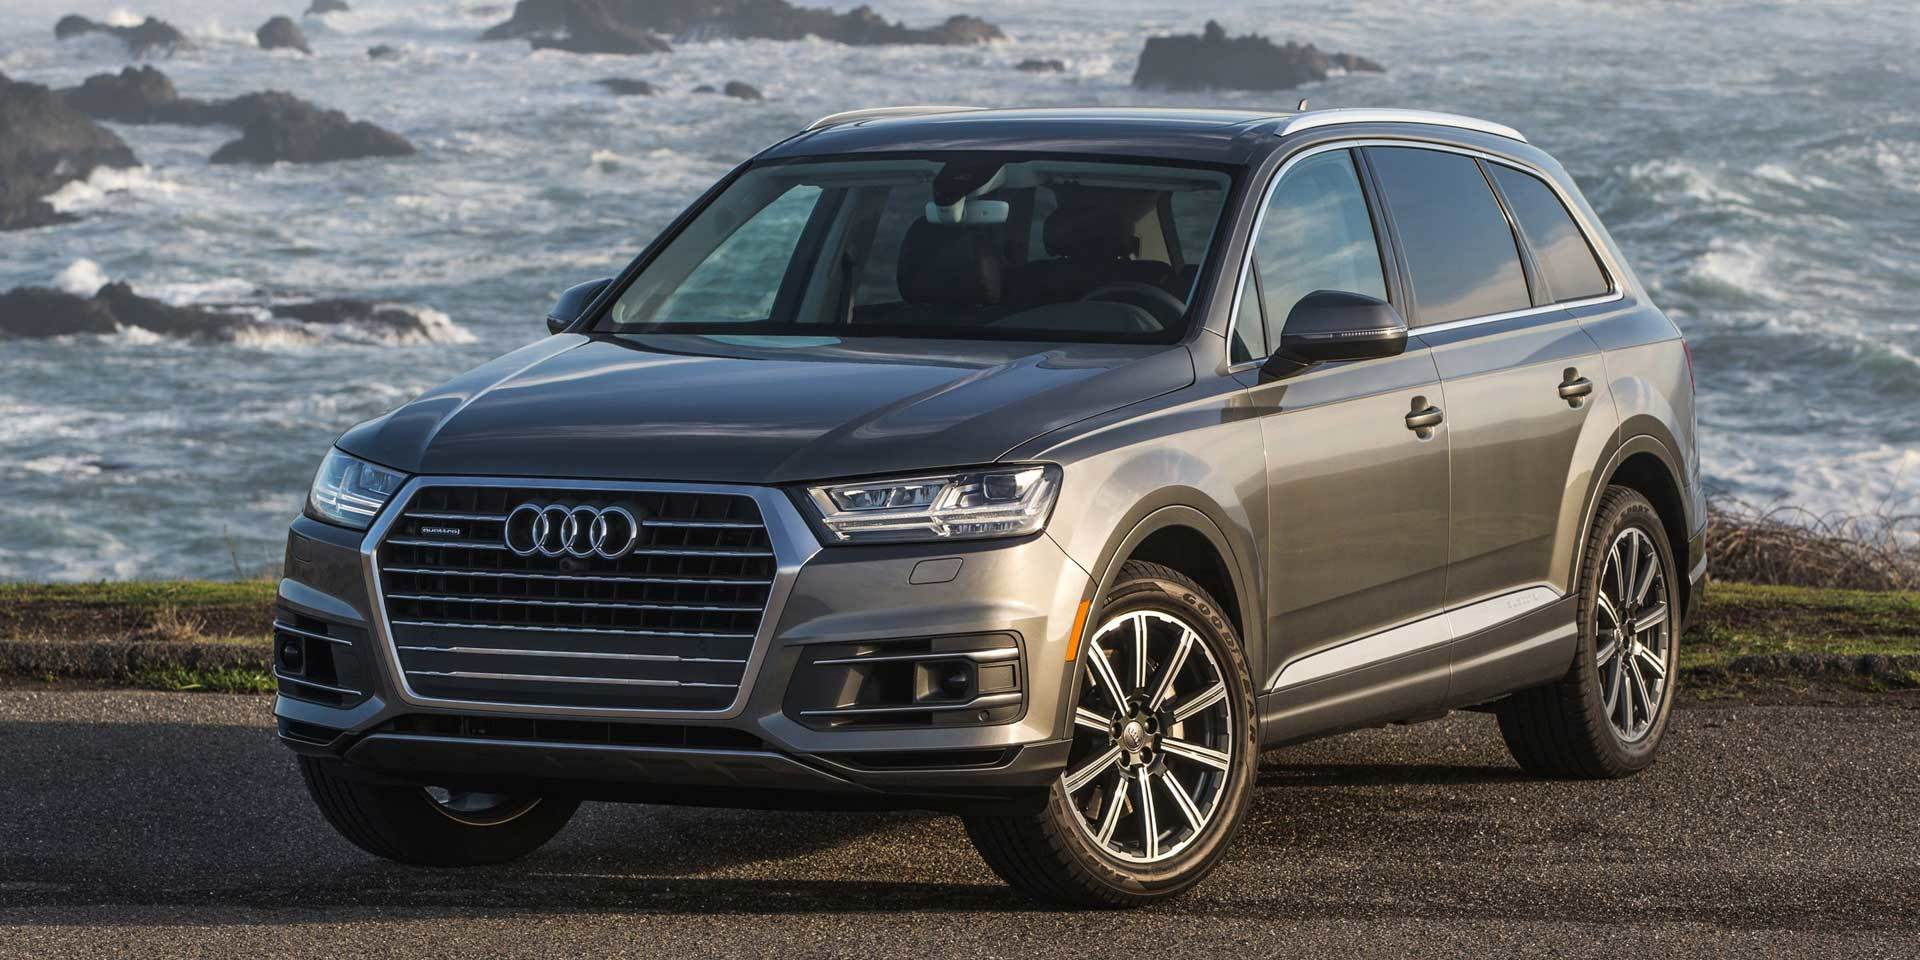 Audi Q7 Lease >> Audi Q7 Lease Deals Offers Cicero Ny